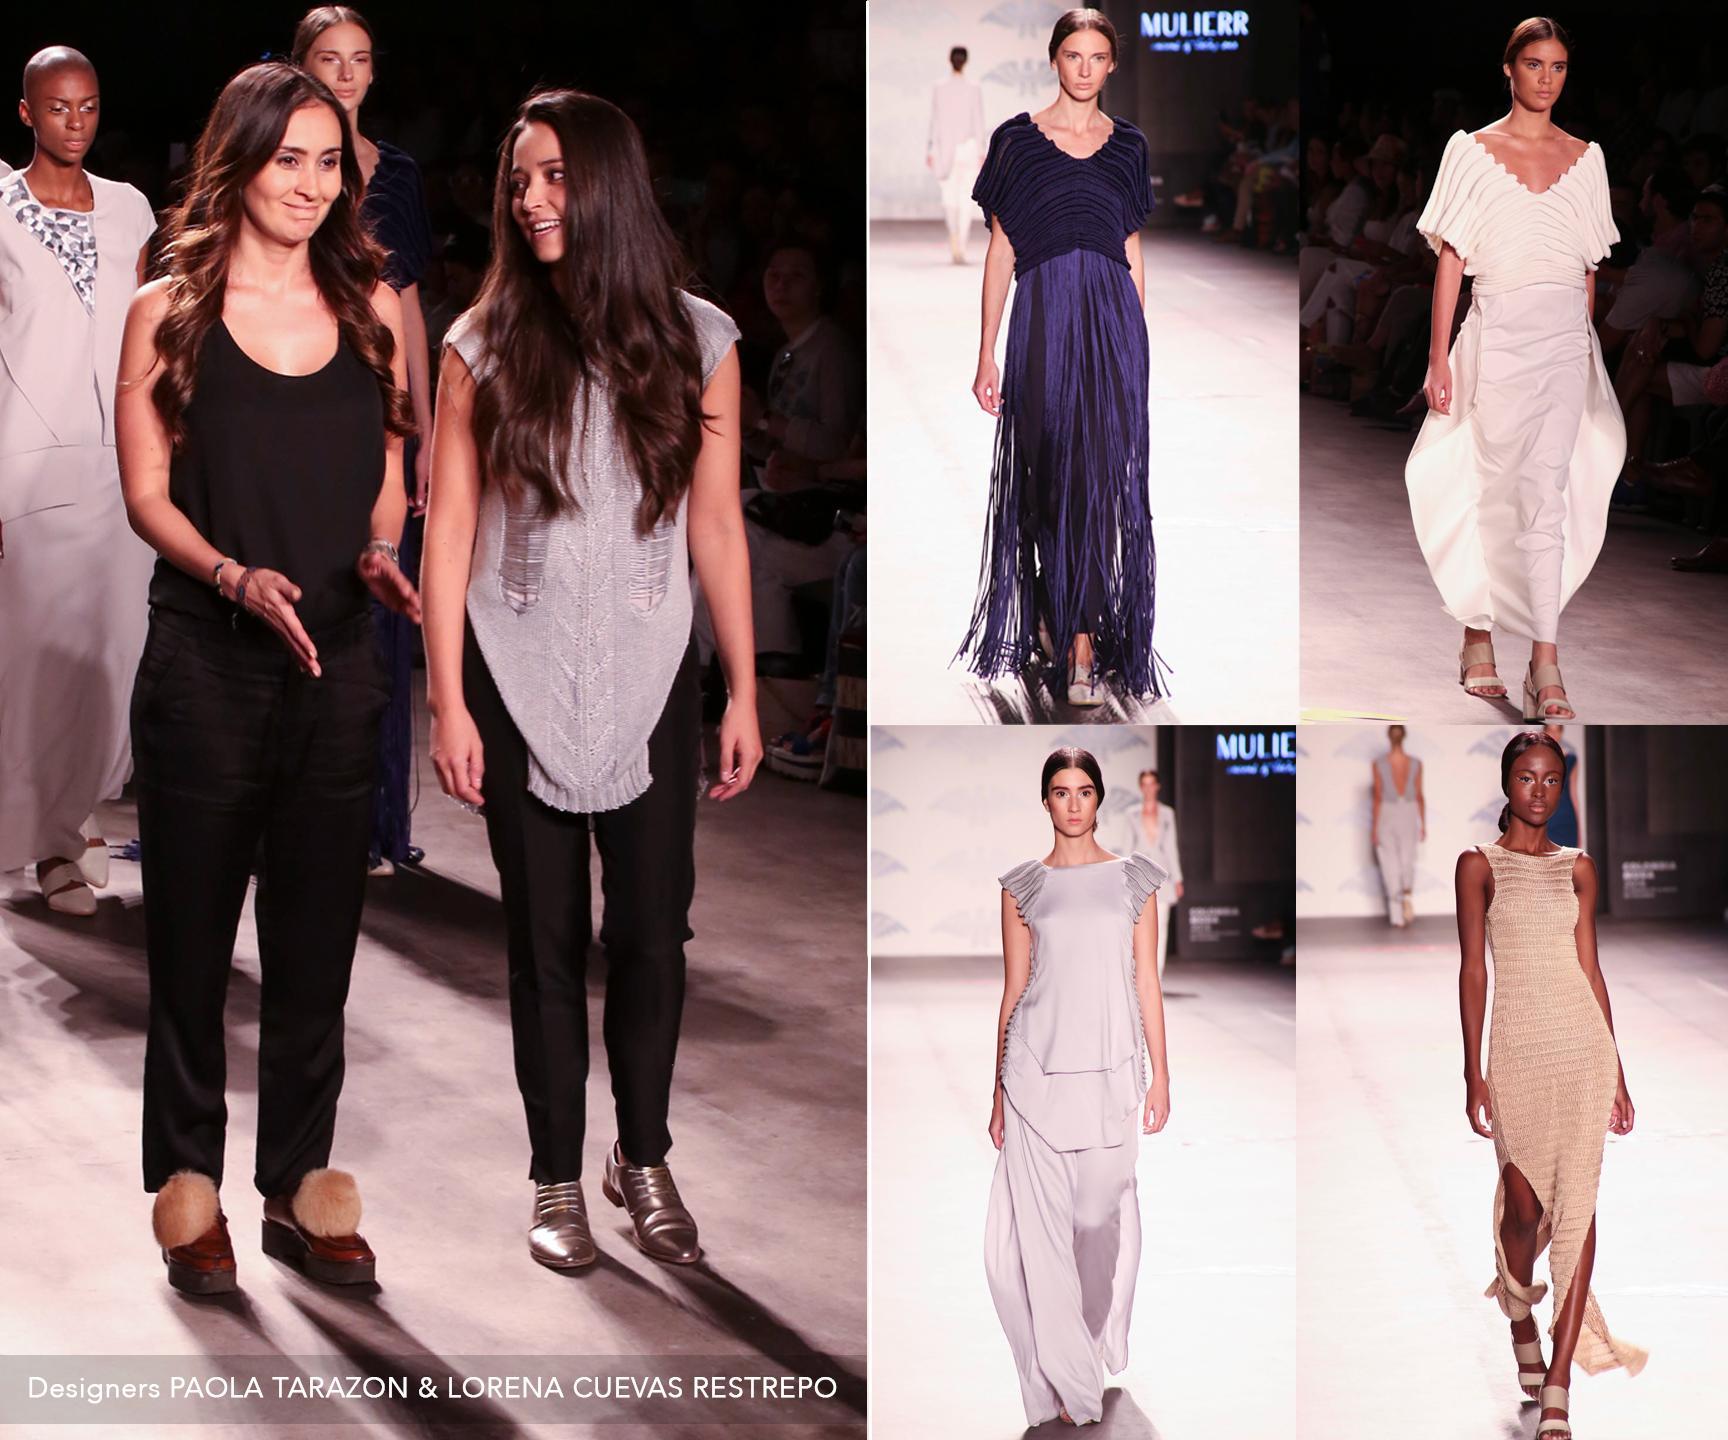 Colombian Designers - Paola Tarazon & Lorena Cuevas Restrepo